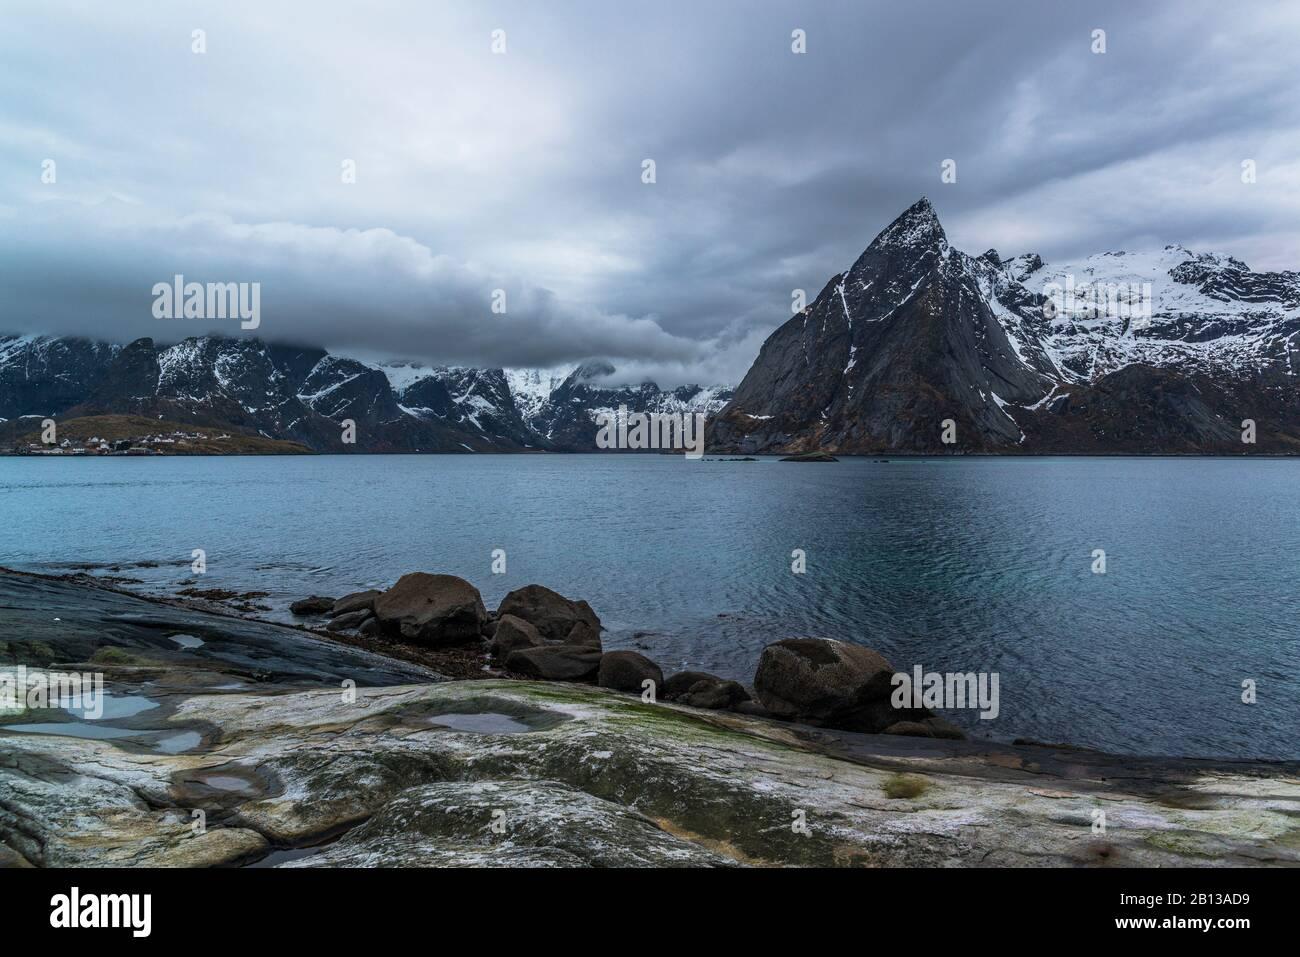 The coast of Hamnøy with the mountain Olstinden,Lofoten,Norway Stock Photo